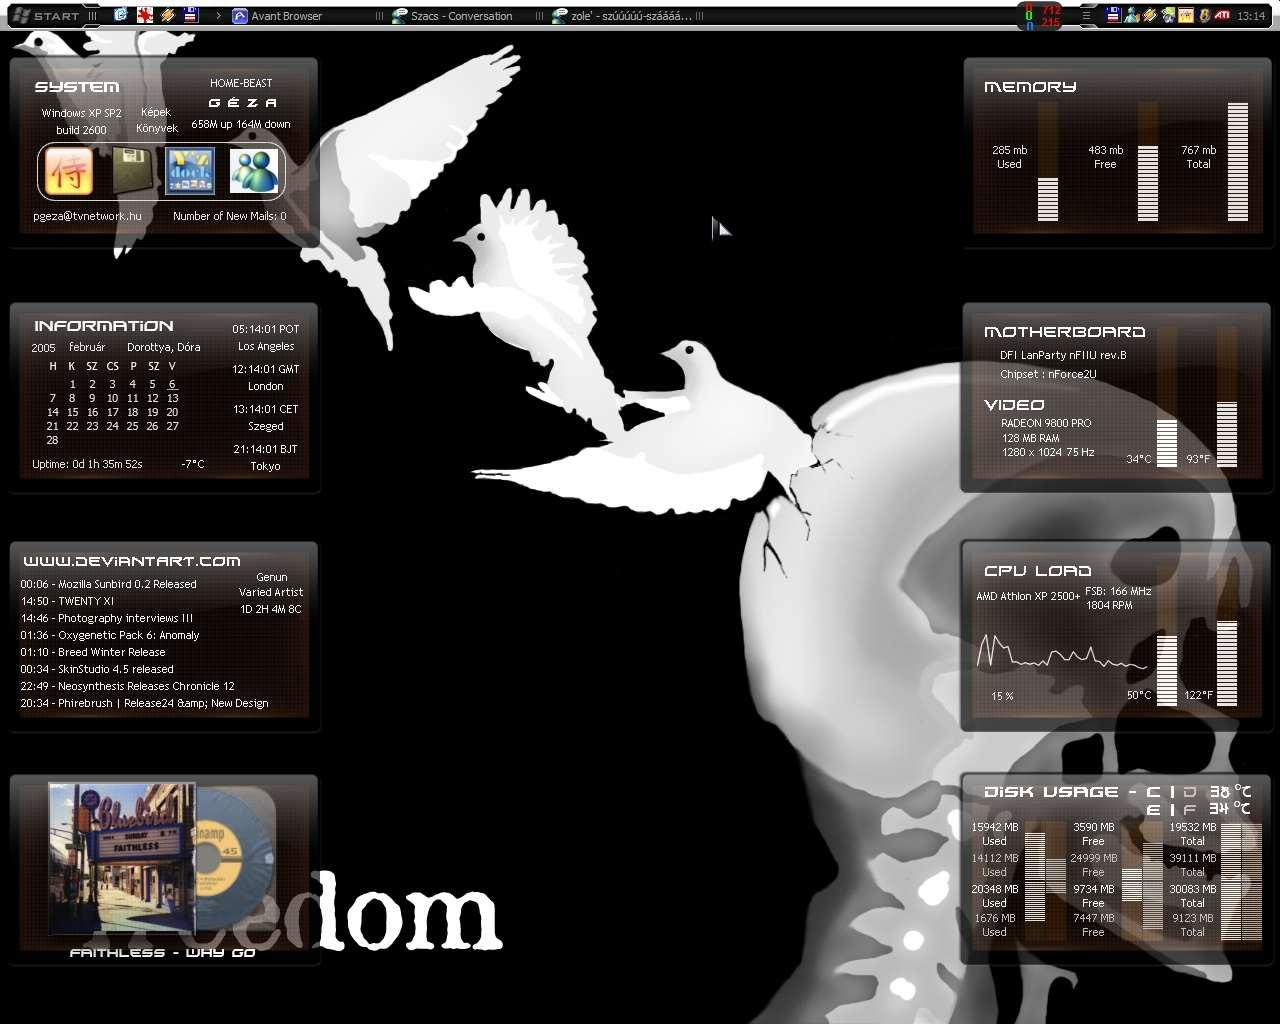 Title: my desktop 02-06-05